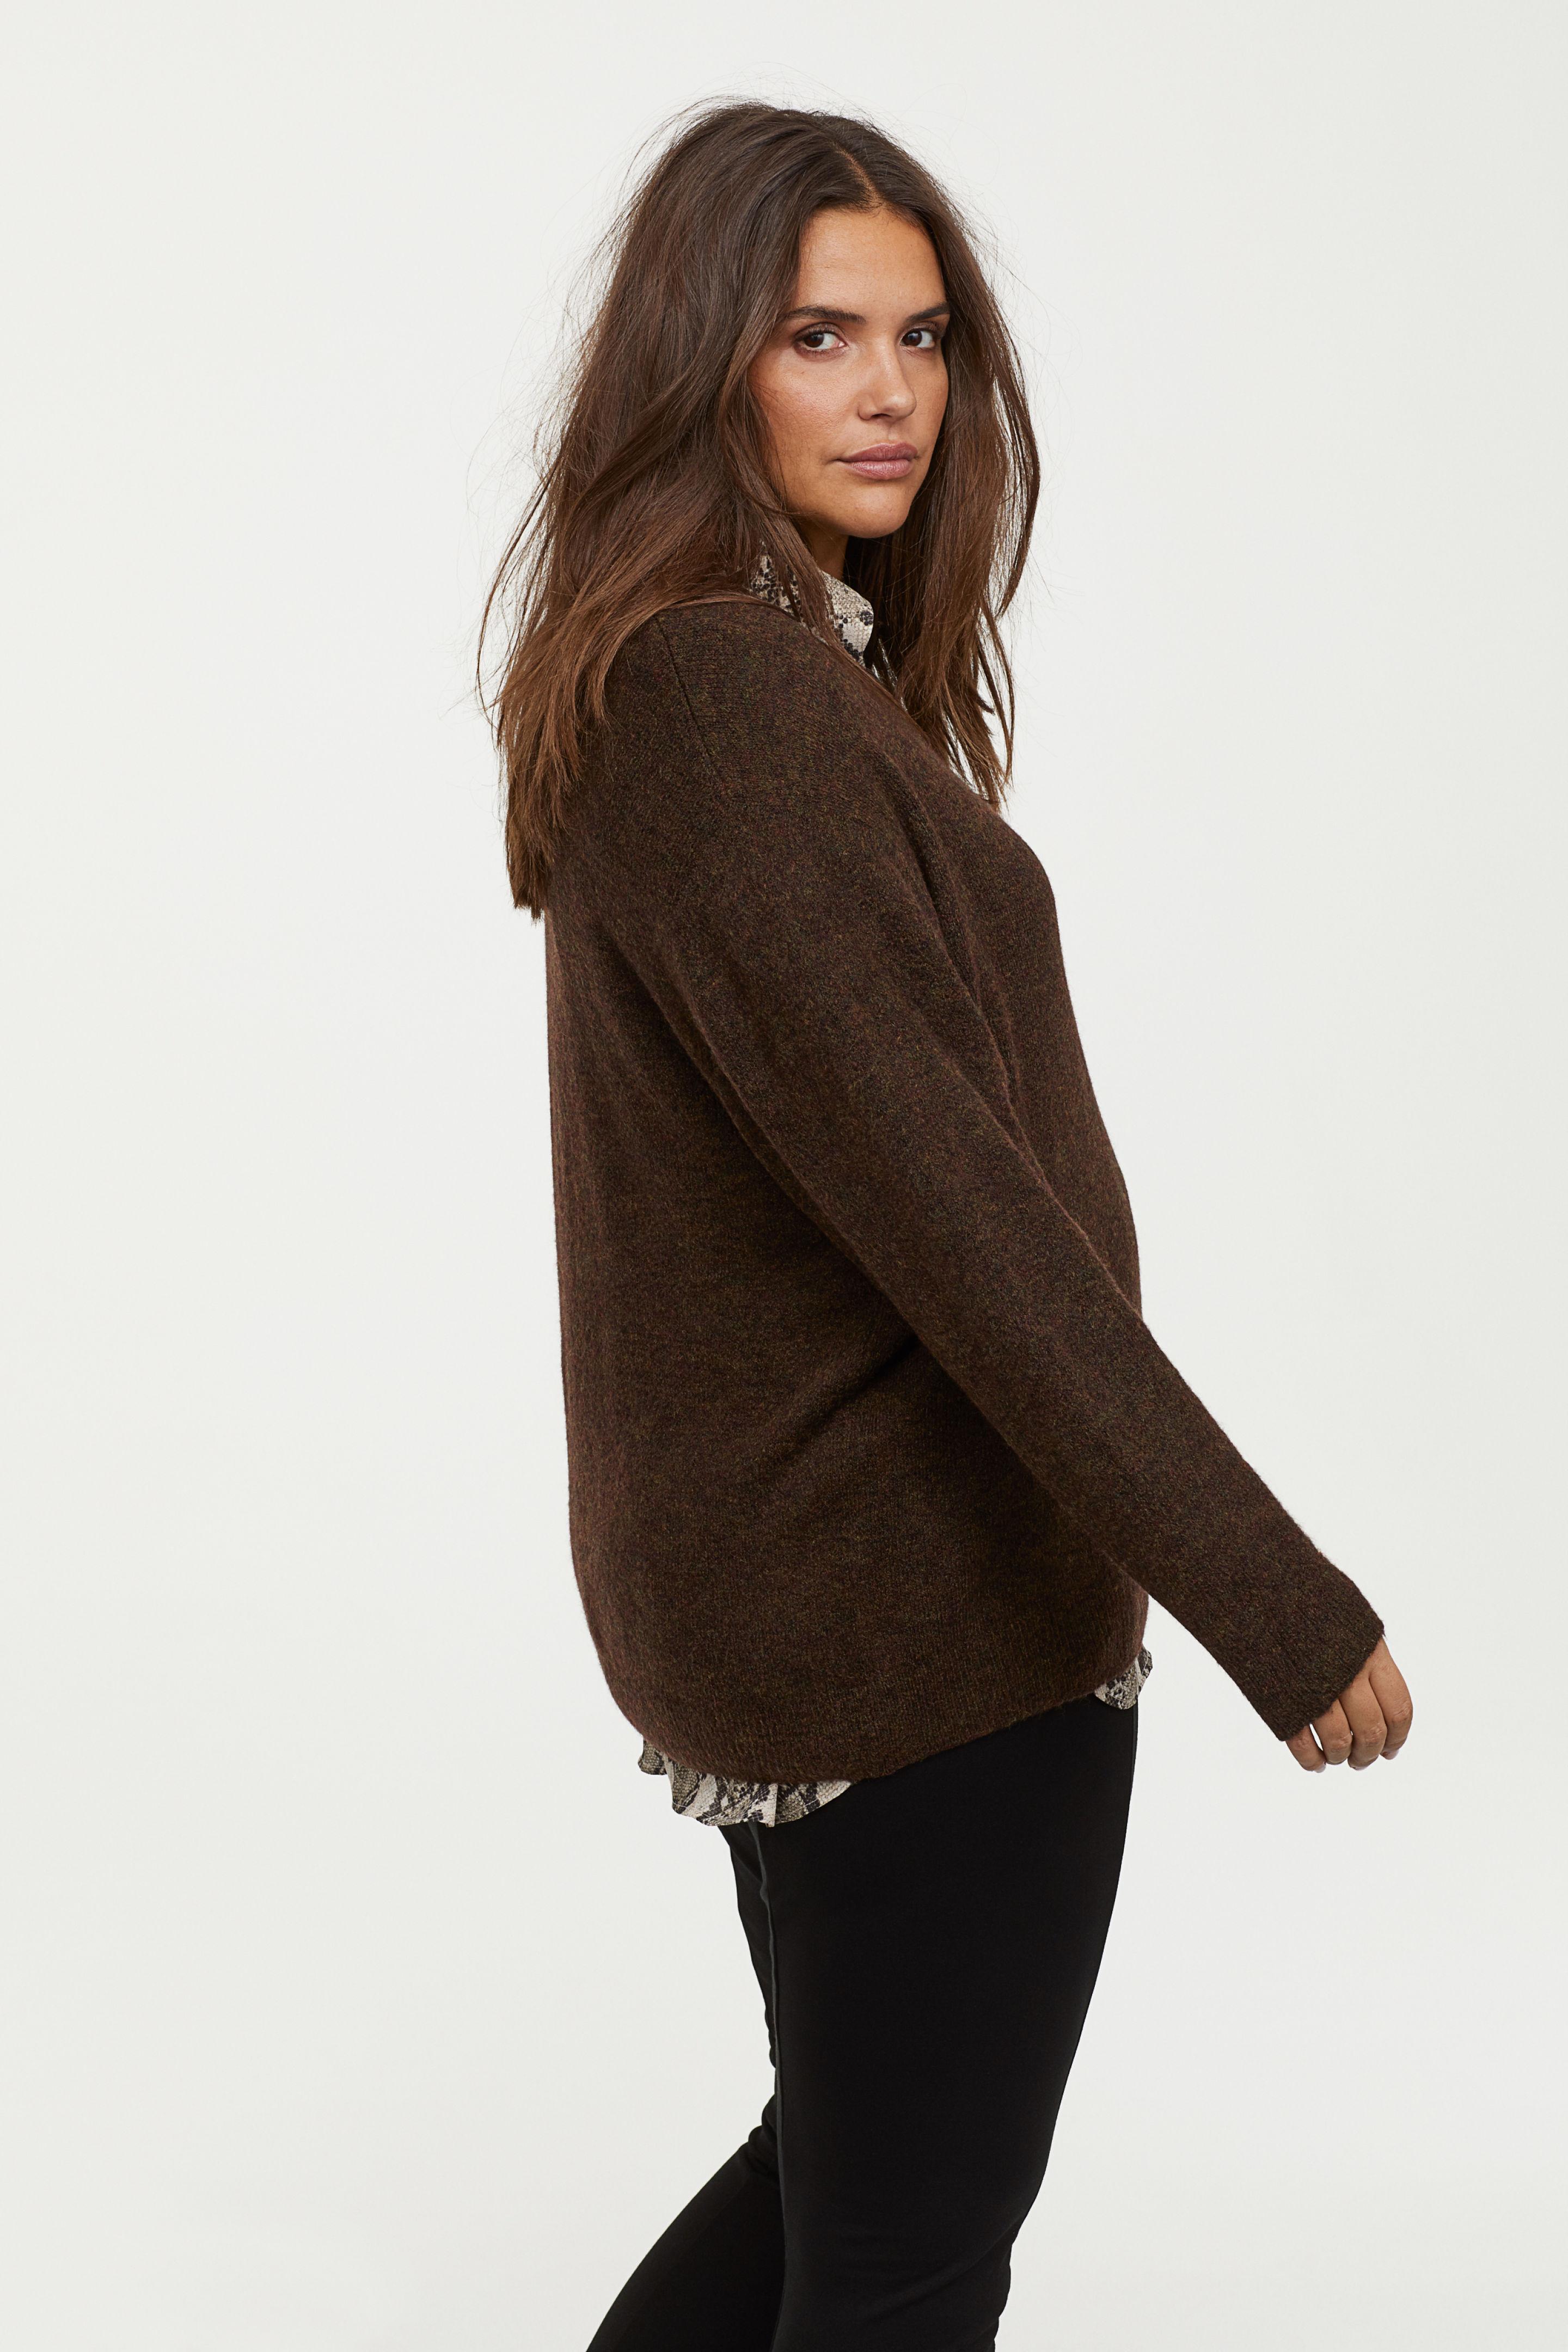 fddfde1a2ea Brown Clothing